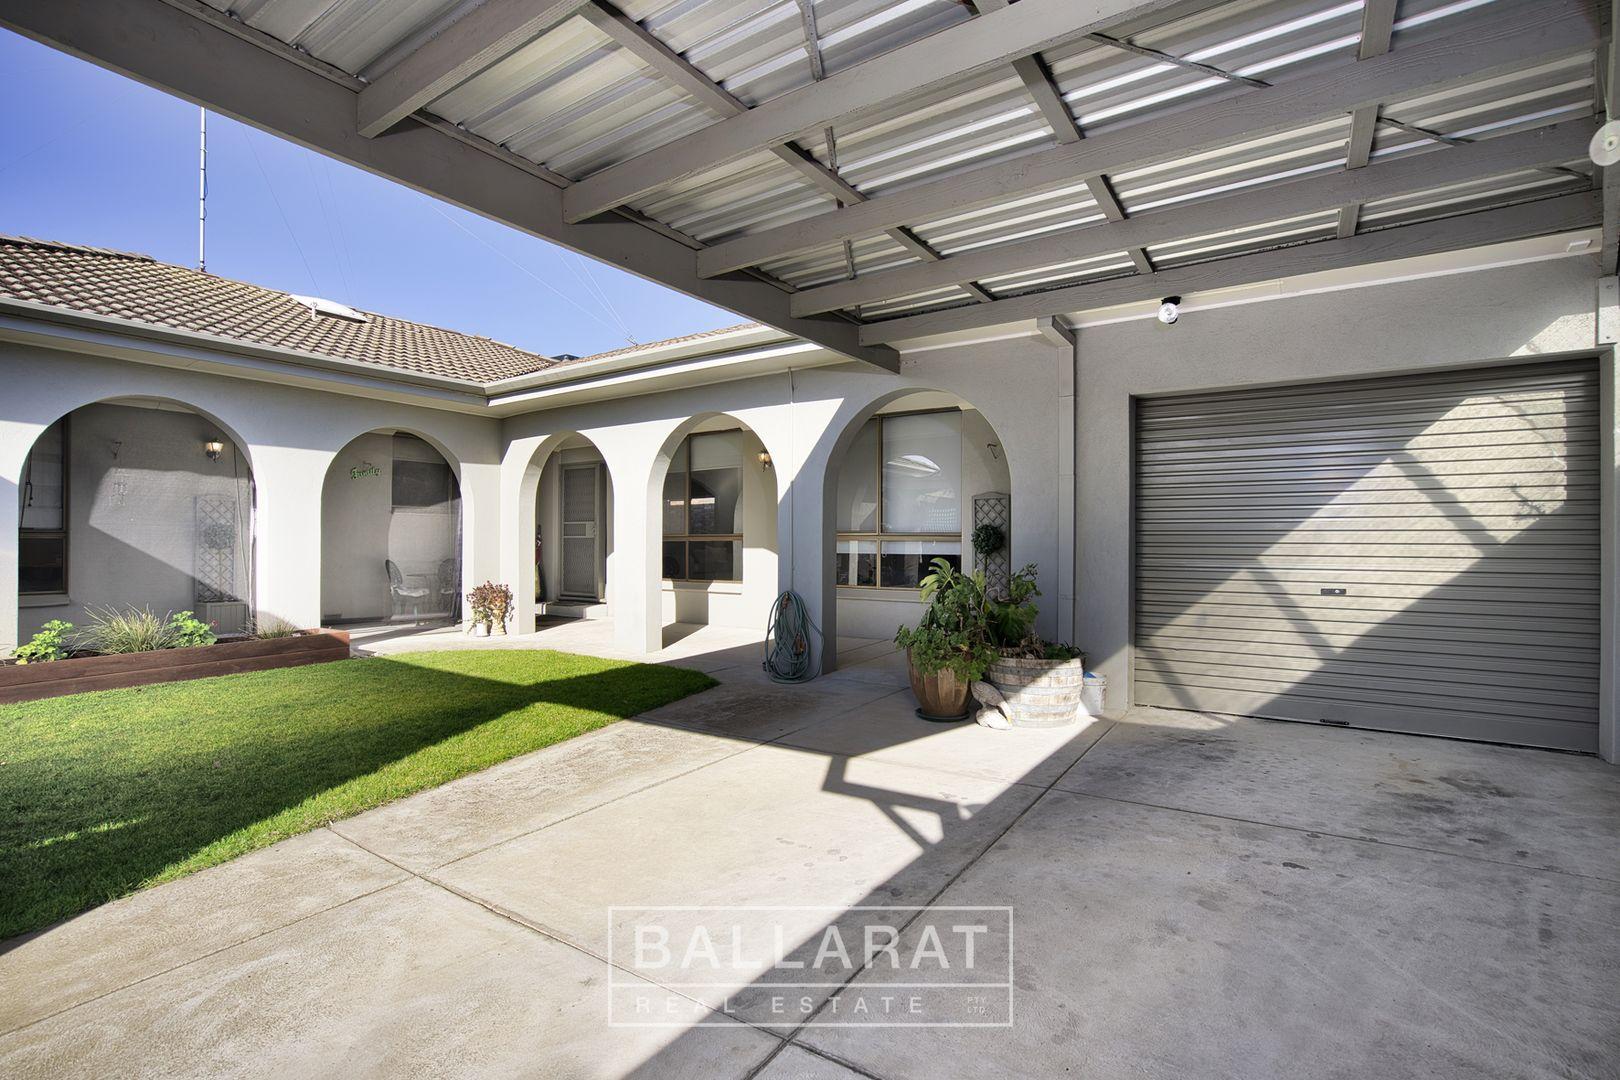 2/403 Pleasant Street South, Ballarat Central VIC 3350, Image 0